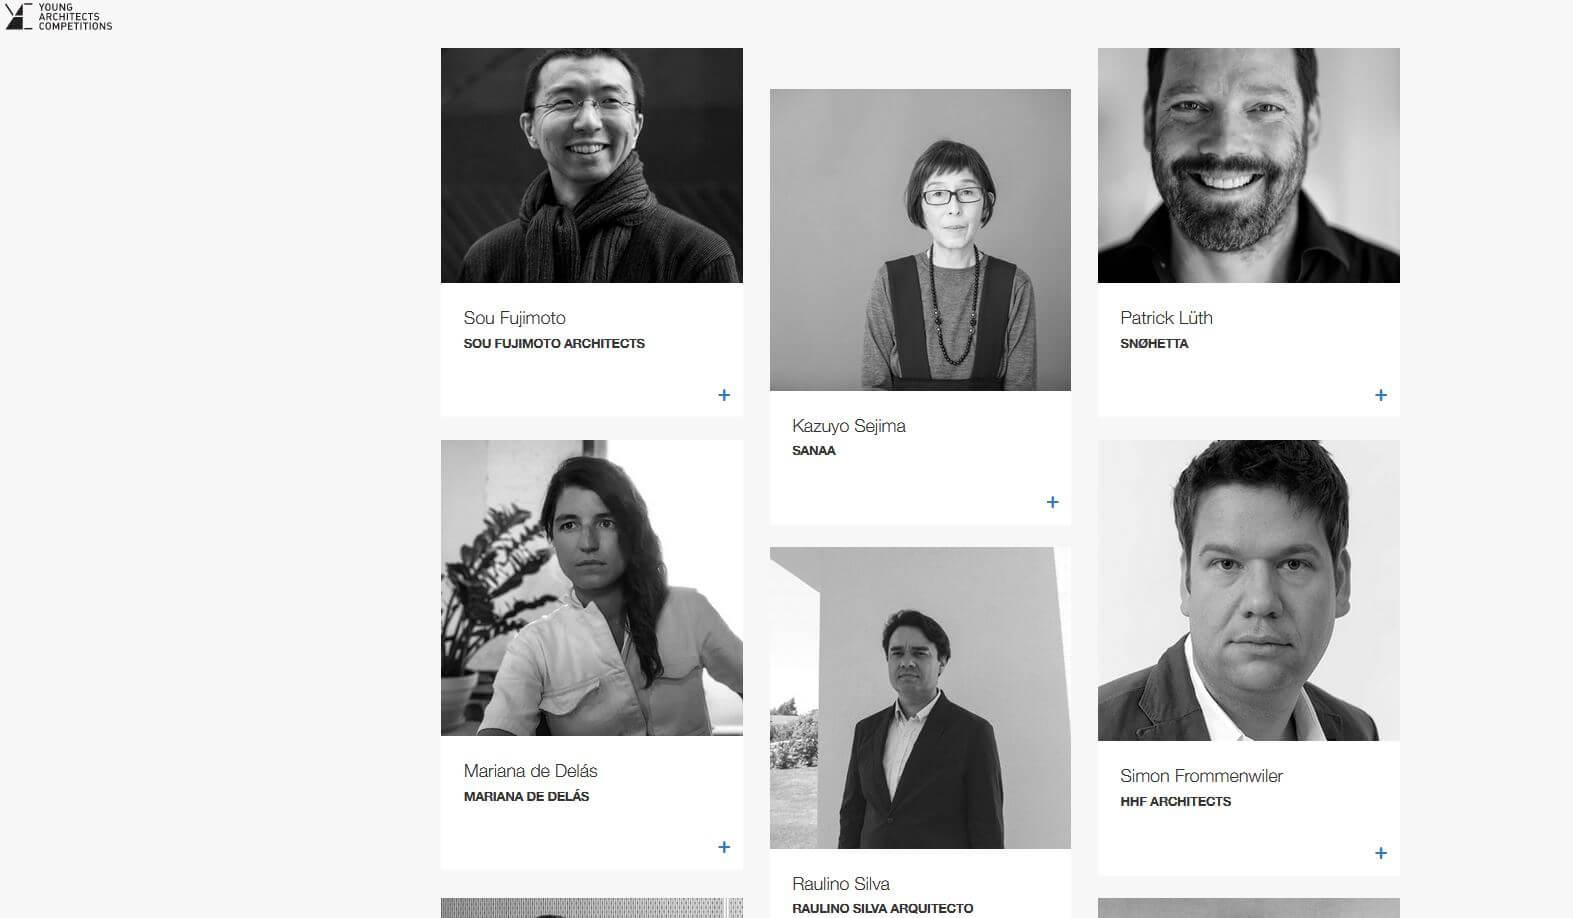 Arquiteto Raulino Silva júri no concurso internacional de arquitetura